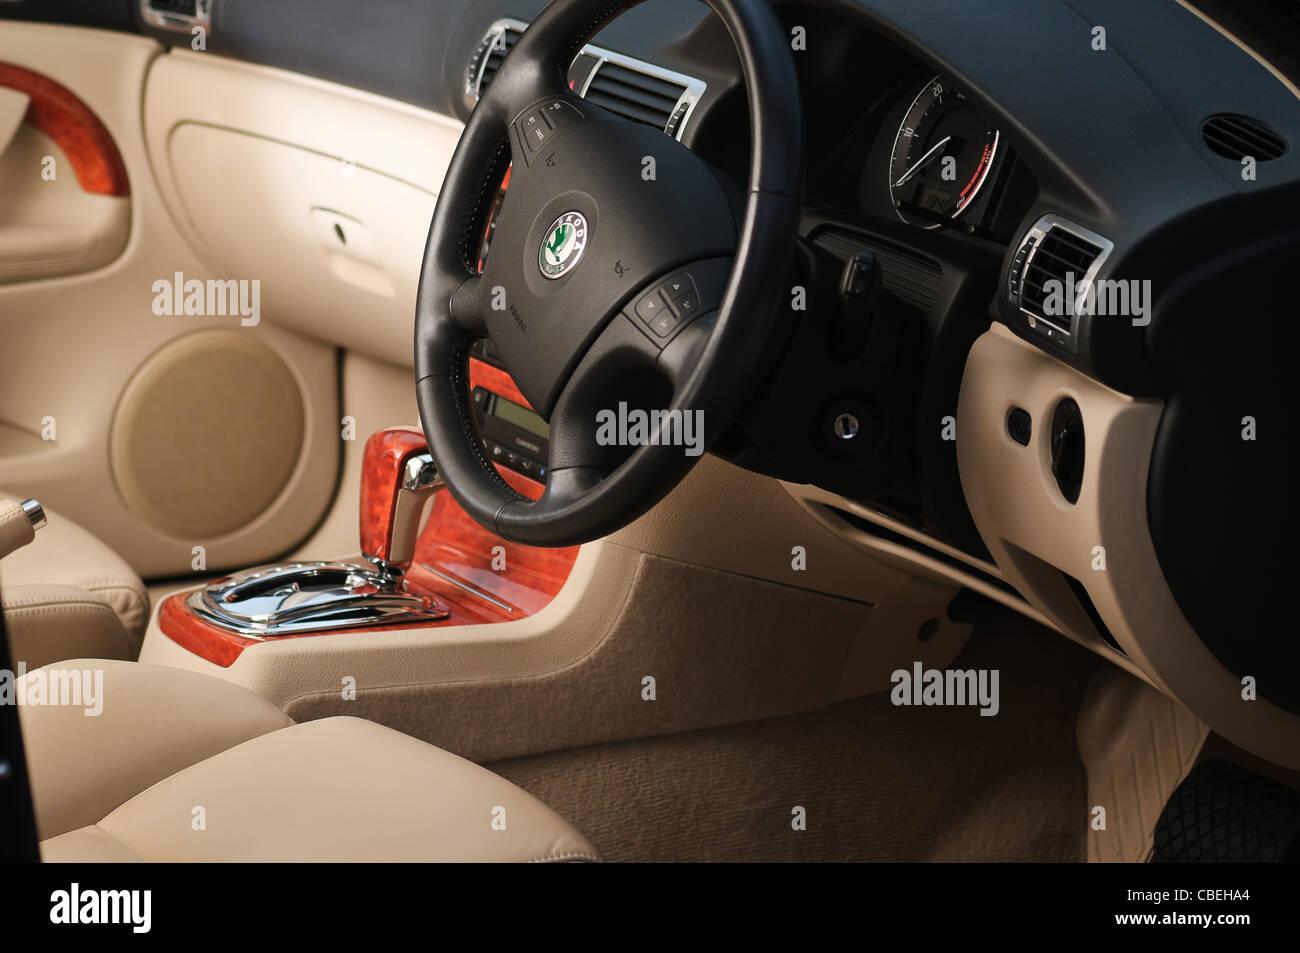 Das Innere von Skoda Auto Stockfoto, Bild: 41502892 - Alamy